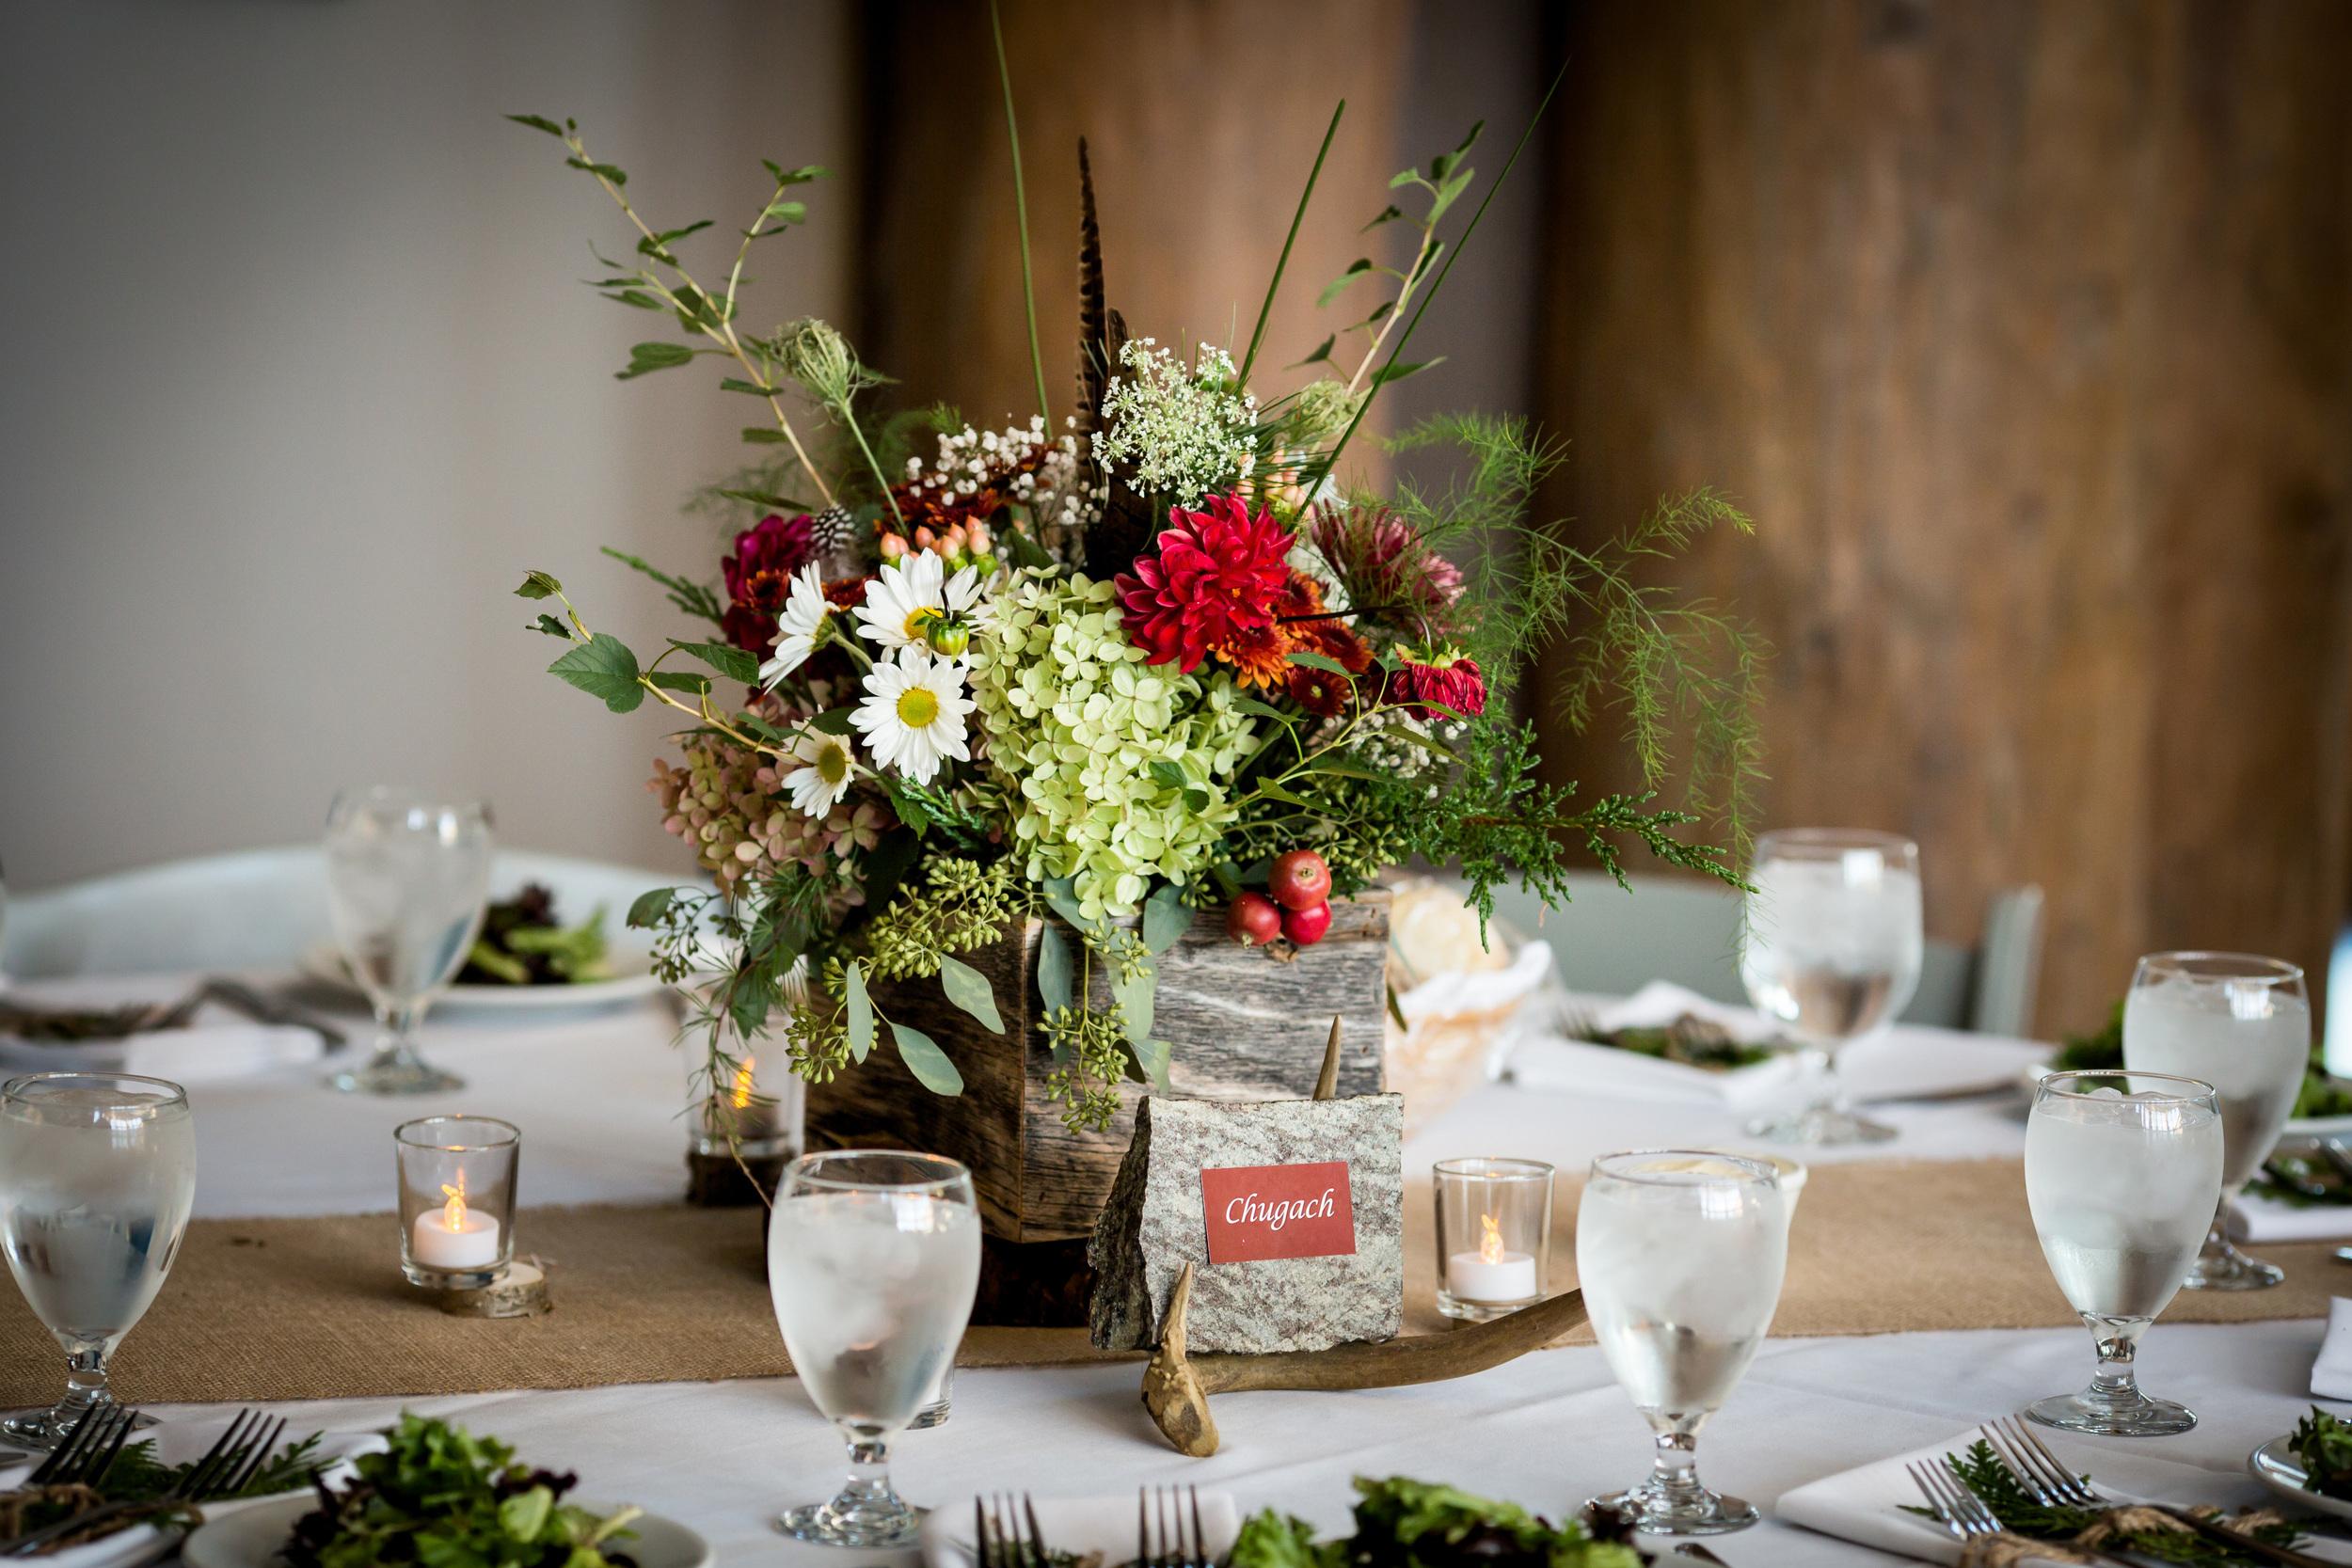 mountain_theme_rustic_wedding_table_centerpiece